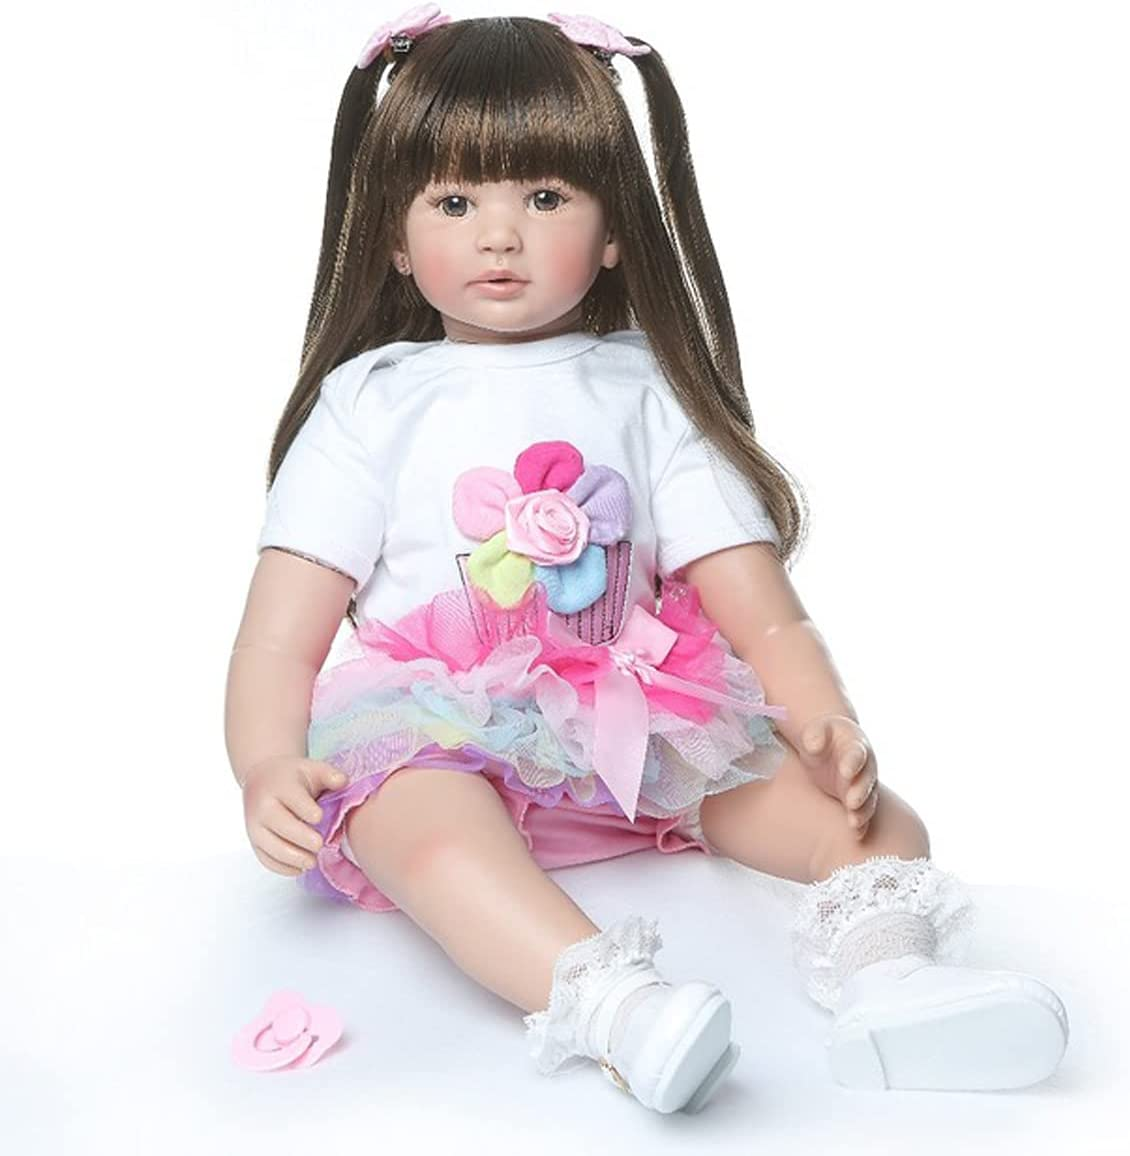 TERABITHIA Cheap bargain 24inch 60cm Big Size Vinyl Bargain sale Reborn Silicone Toddler Pr